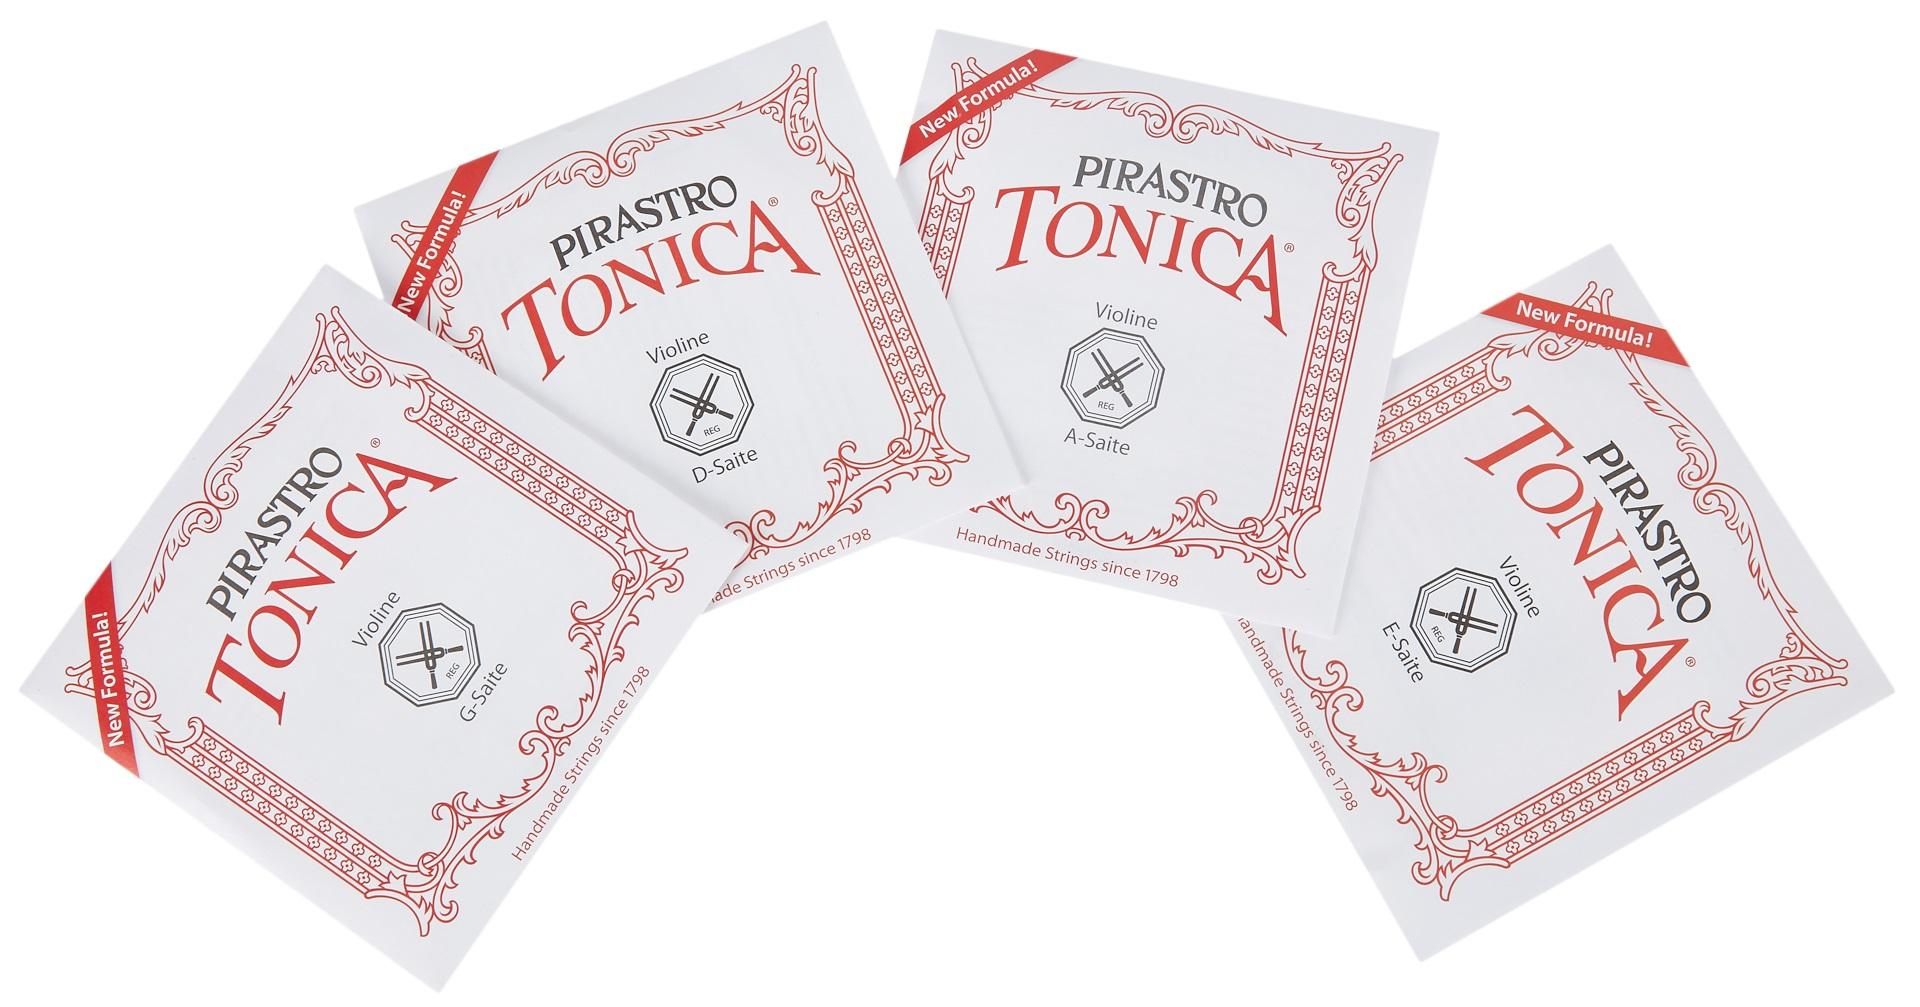 Pirastro Tonica Vln Set E-ball medium